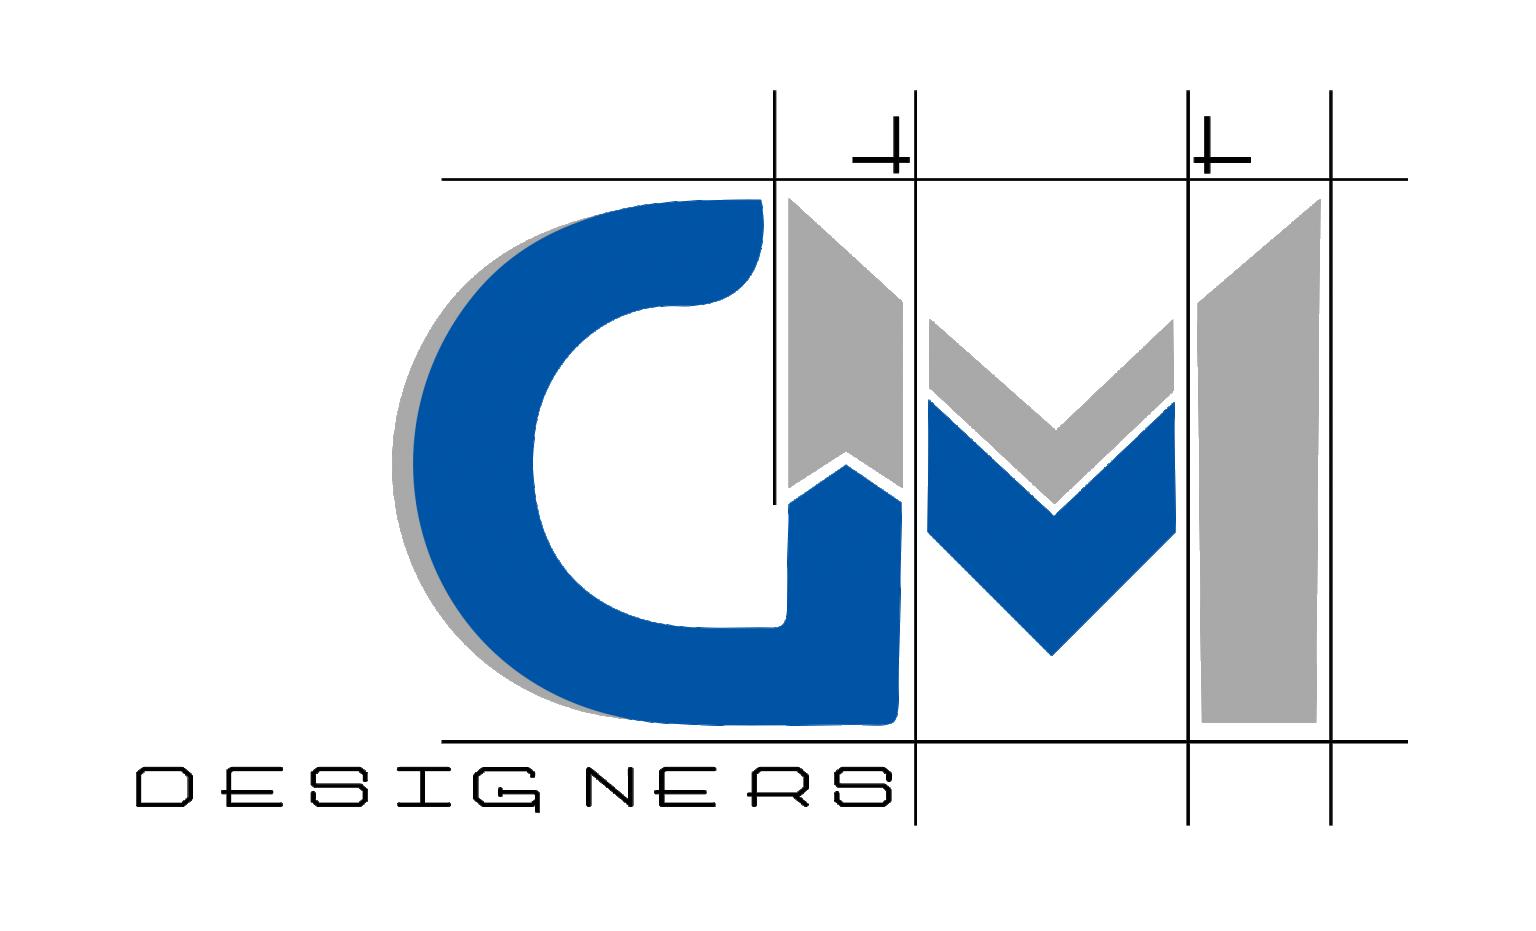 GM Designers